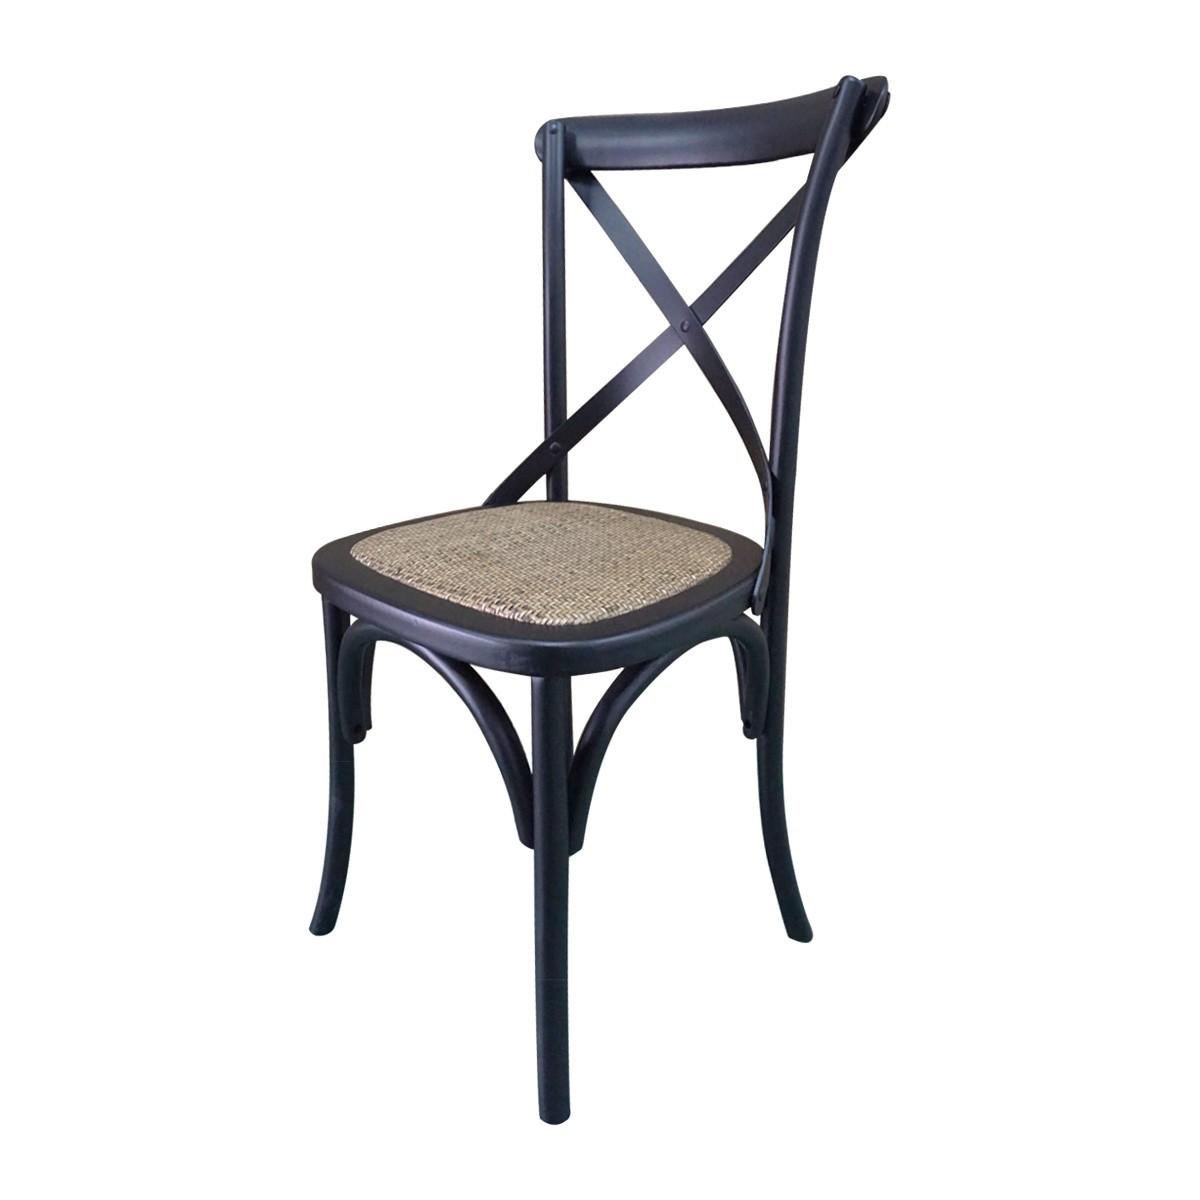 set of 2 hamptons cross back dining chair birch american oak rattan seat wholesales direct. Black Bedroom Furniture Sets. Home Design Ideas